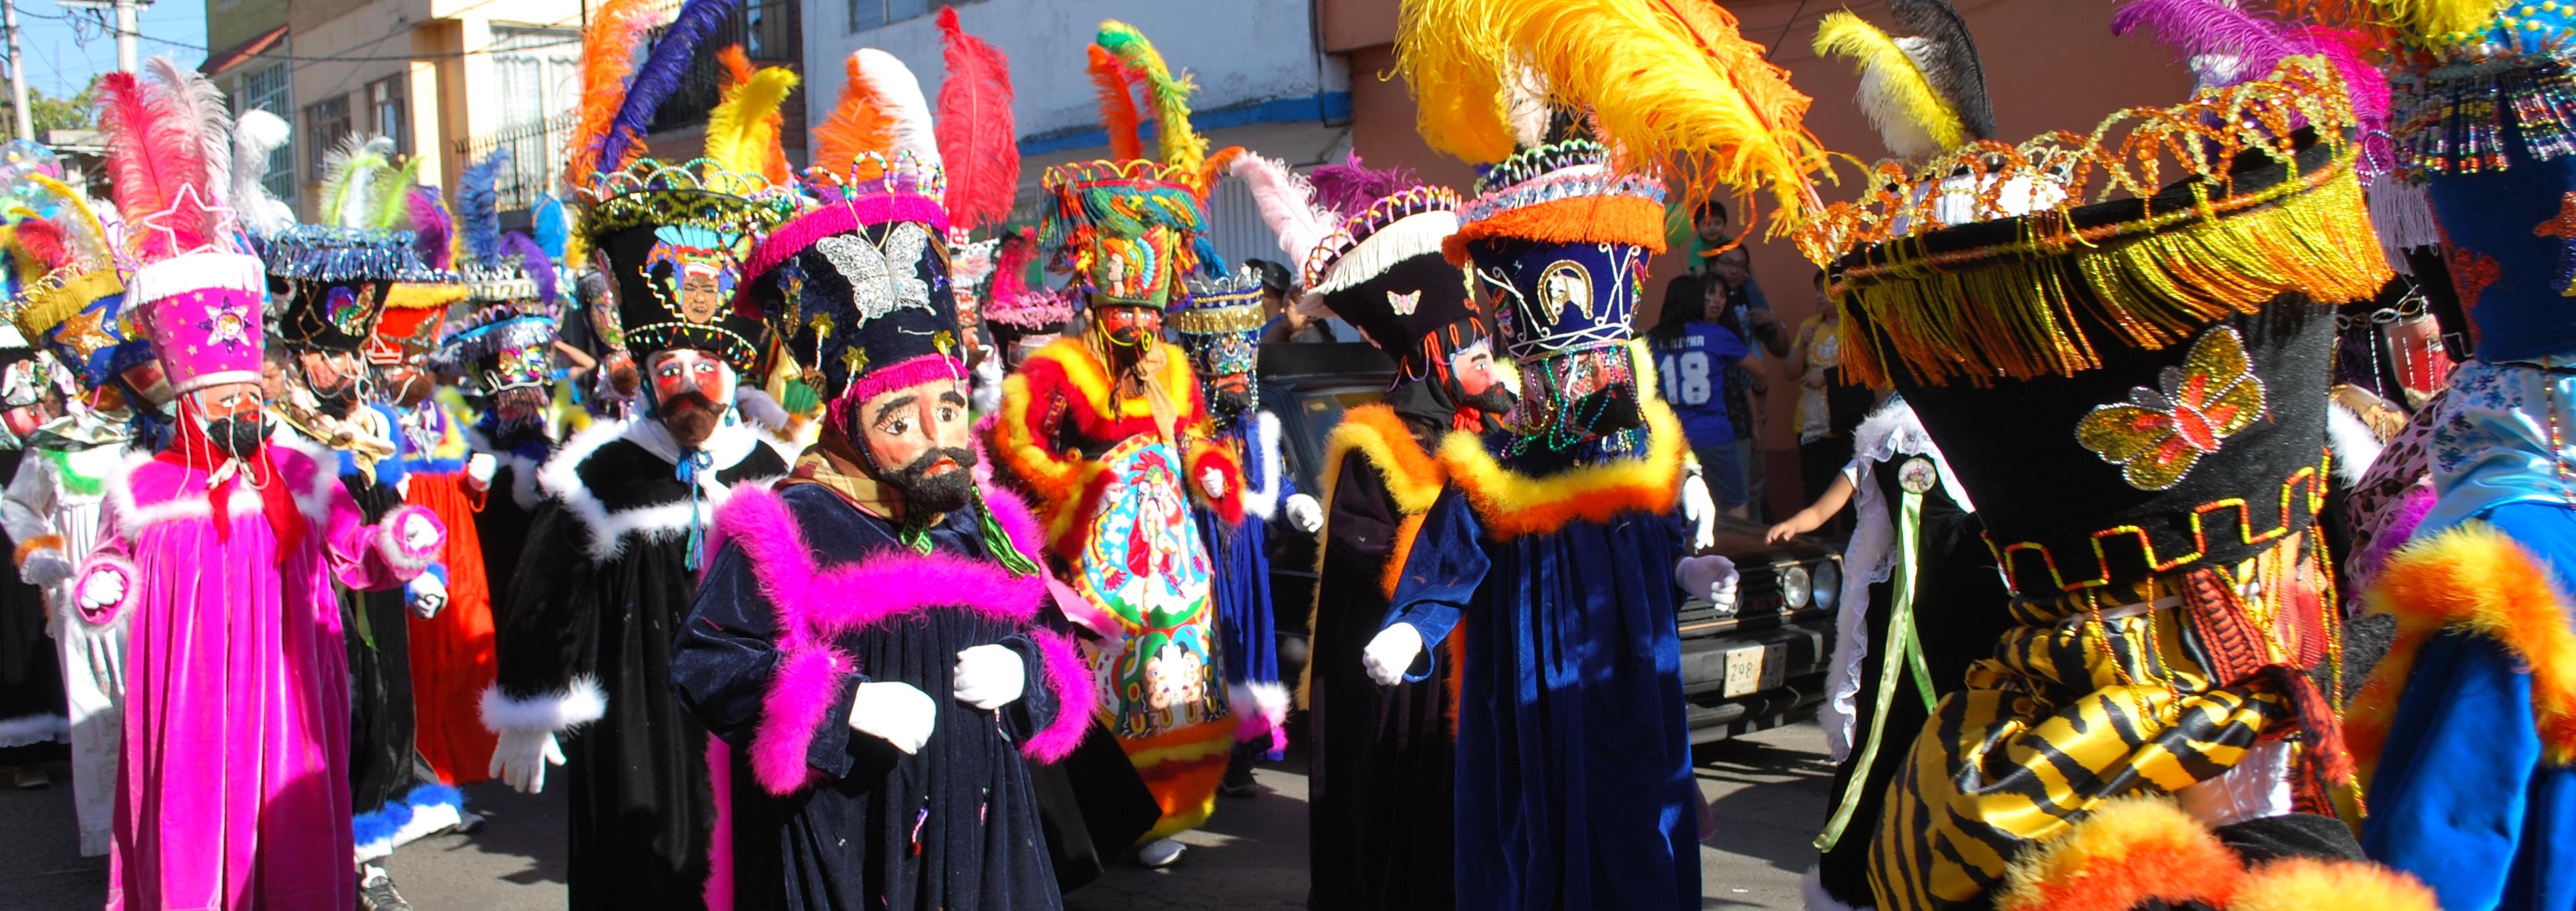 Mexicaltzingo